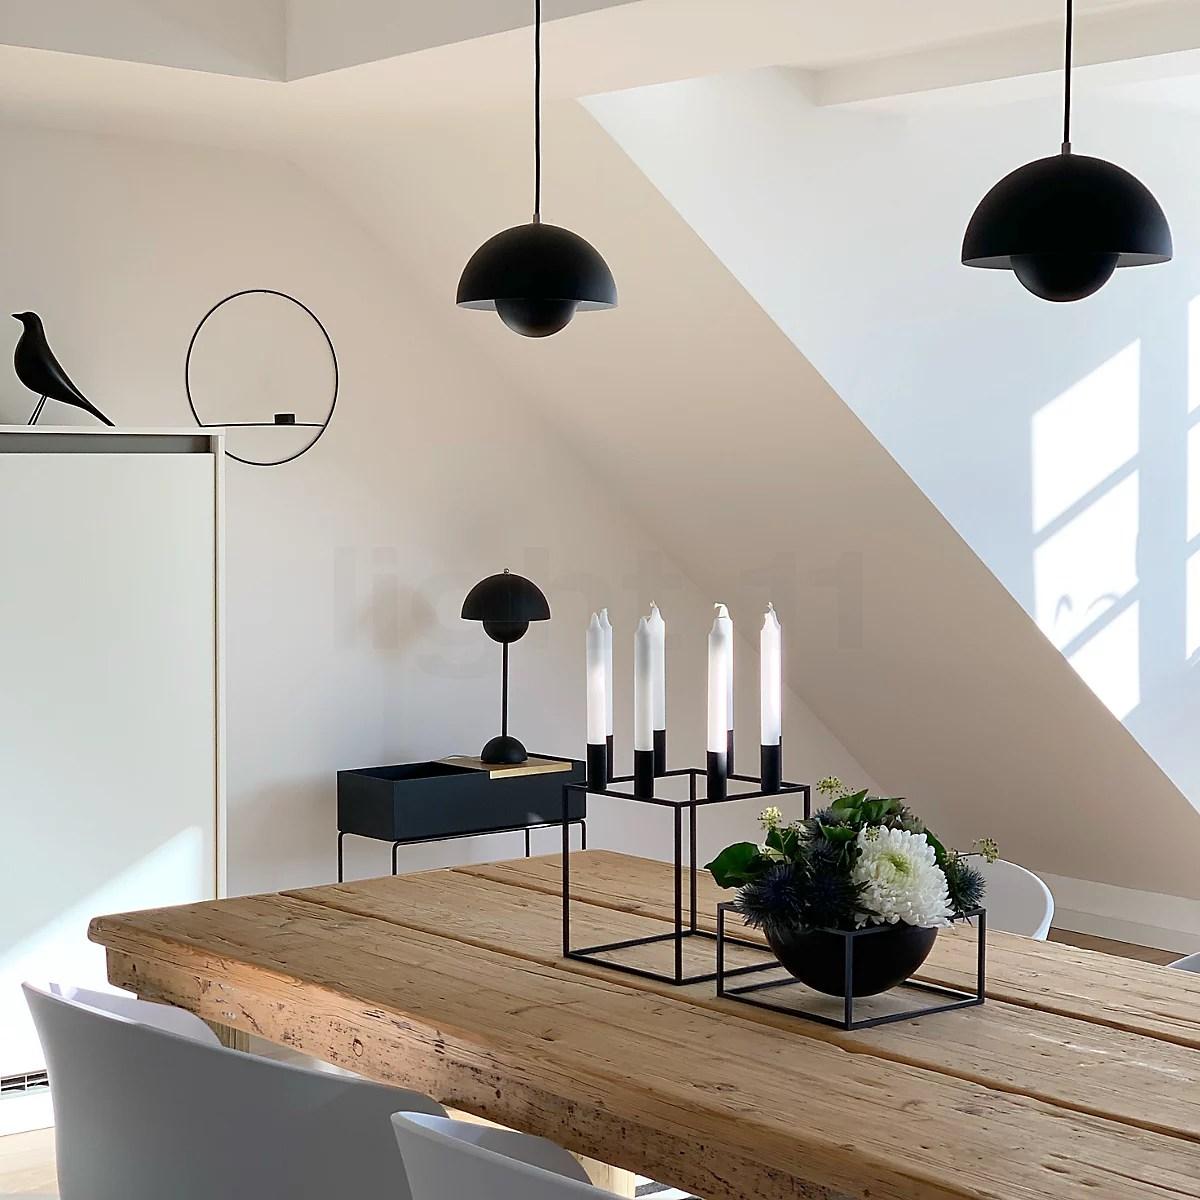 Buy Tradition Flowerpot Vp3 Table Lamp At Light11 Eu